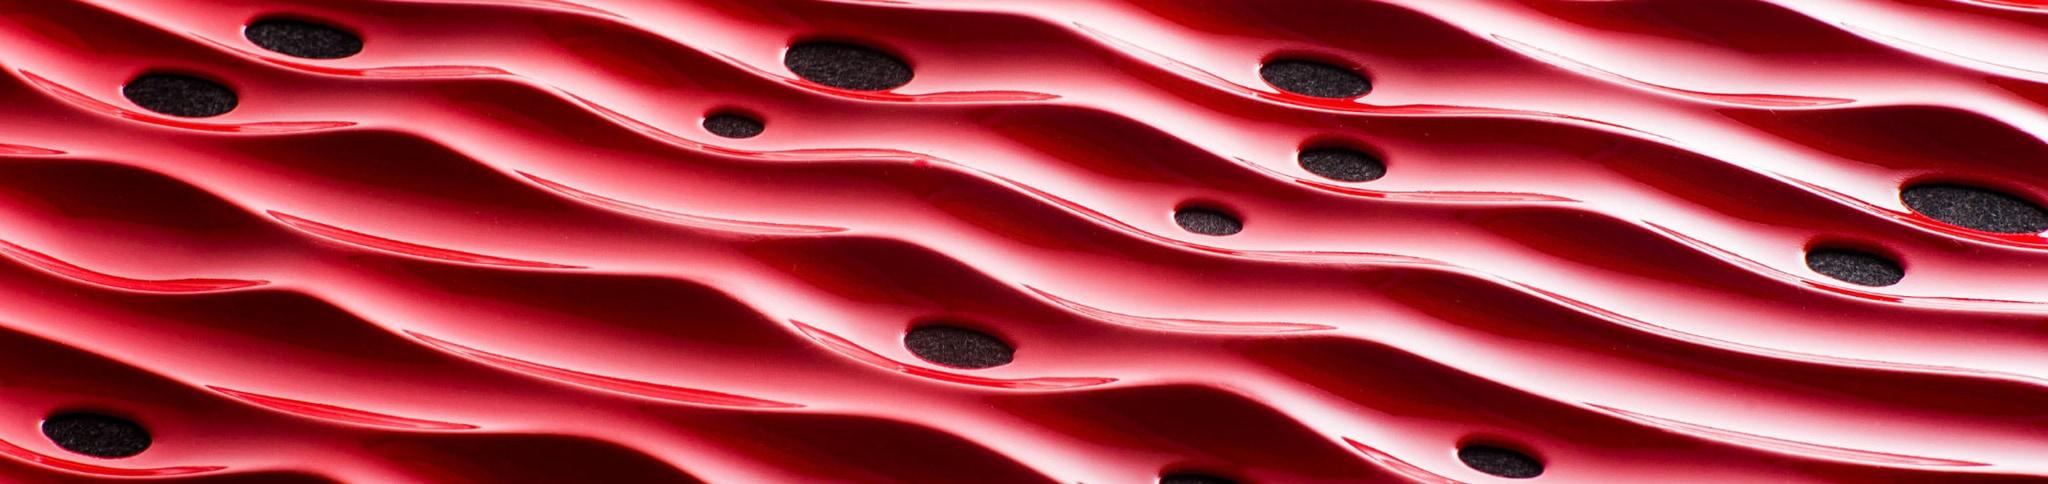 Artnovion Red Wavy Acoustic Wall Panels